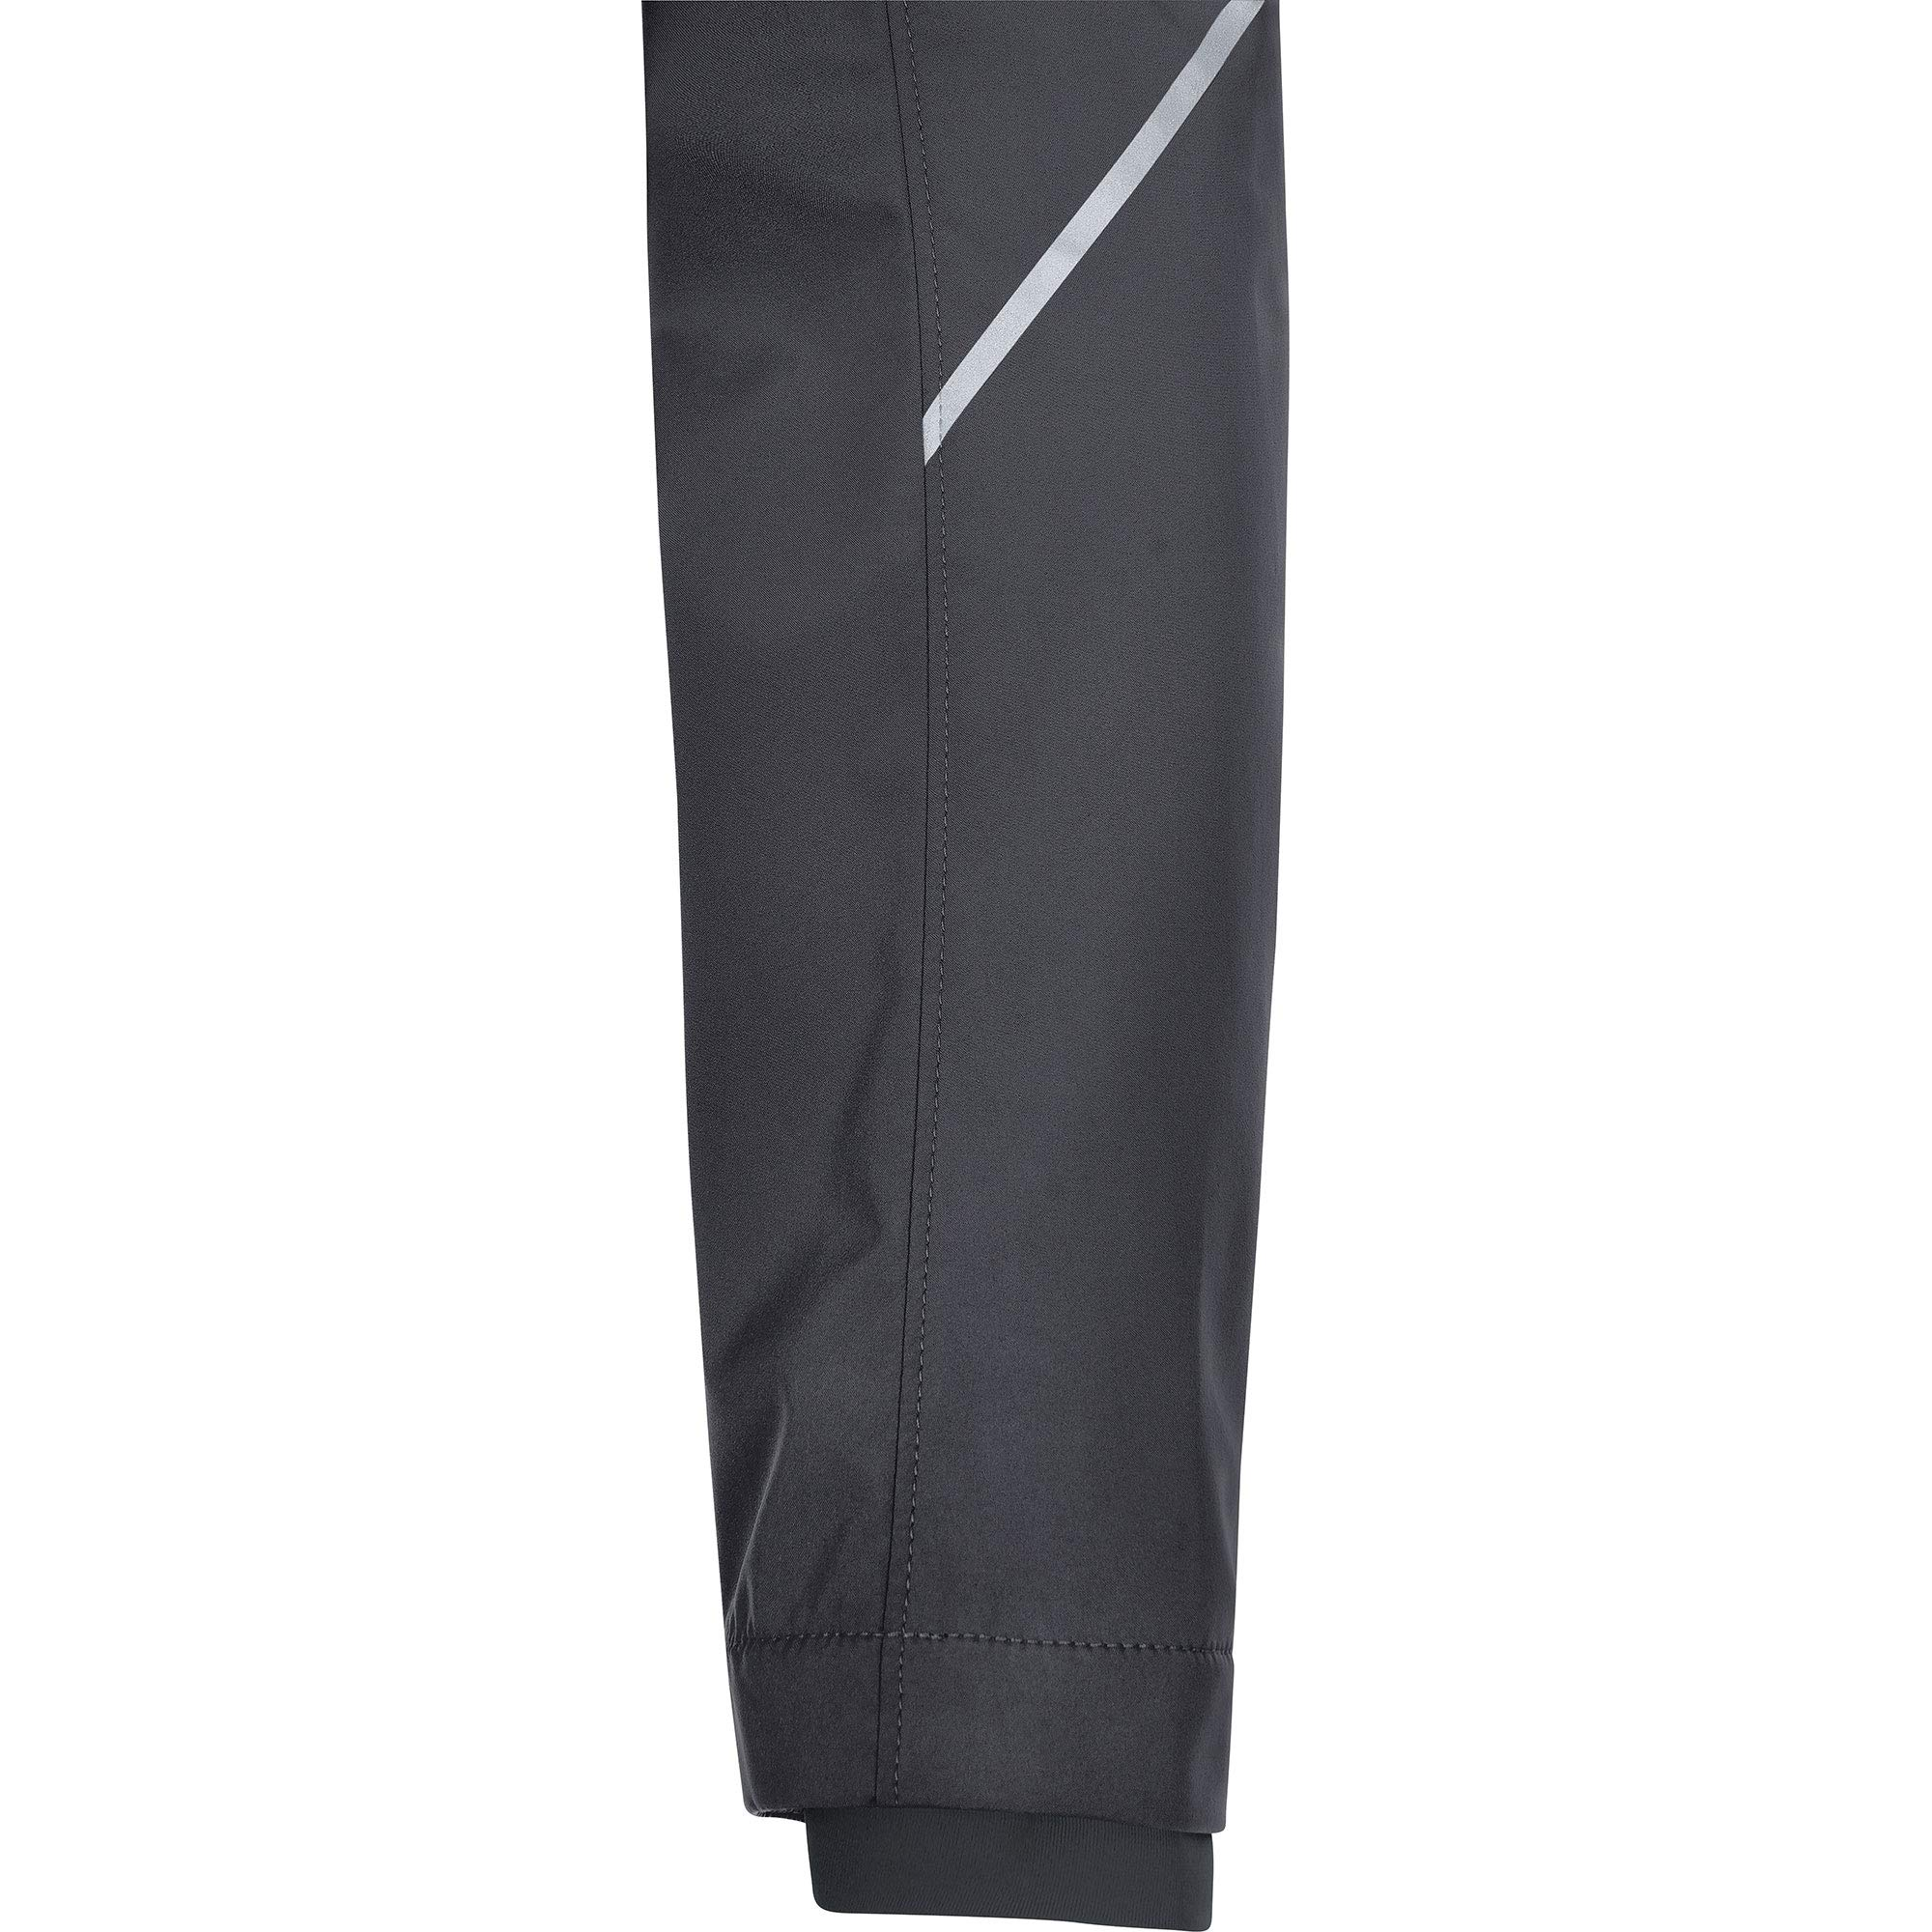 Gore Women's R3 Wmn Partial Gws Jacket,  terra grey/black,  M by GORE WEAR (Image #7)